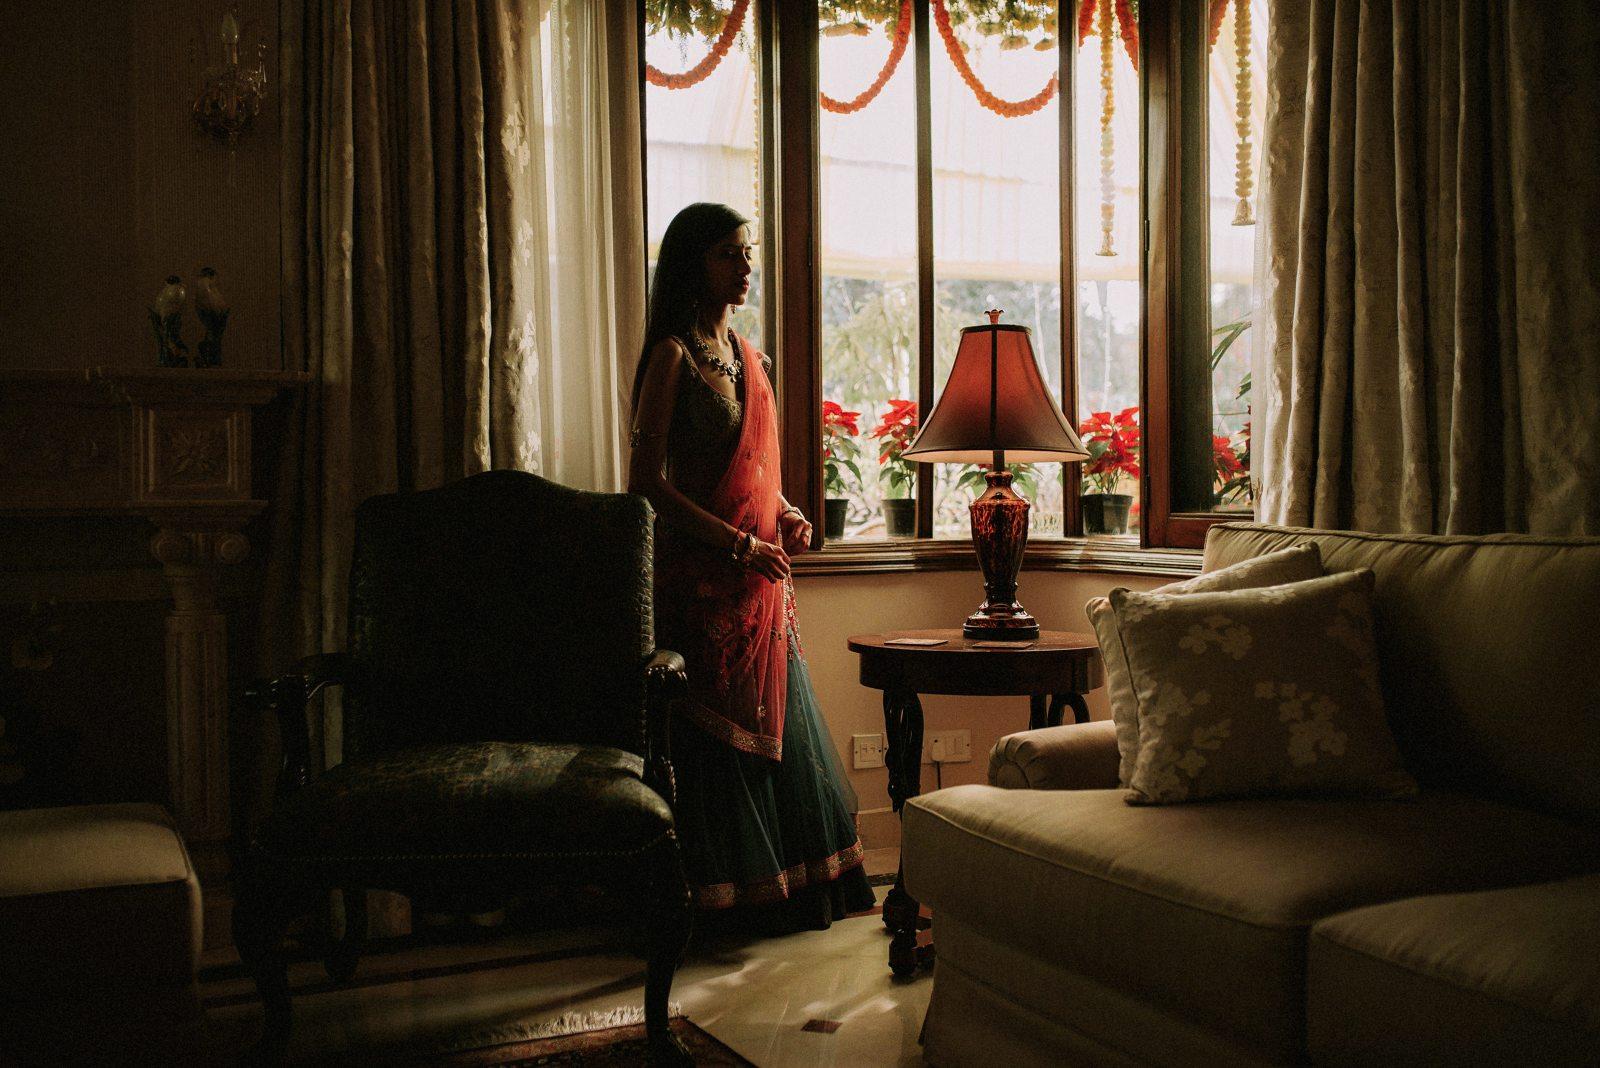 wedding in india - destination wedding photographer-24.jpg